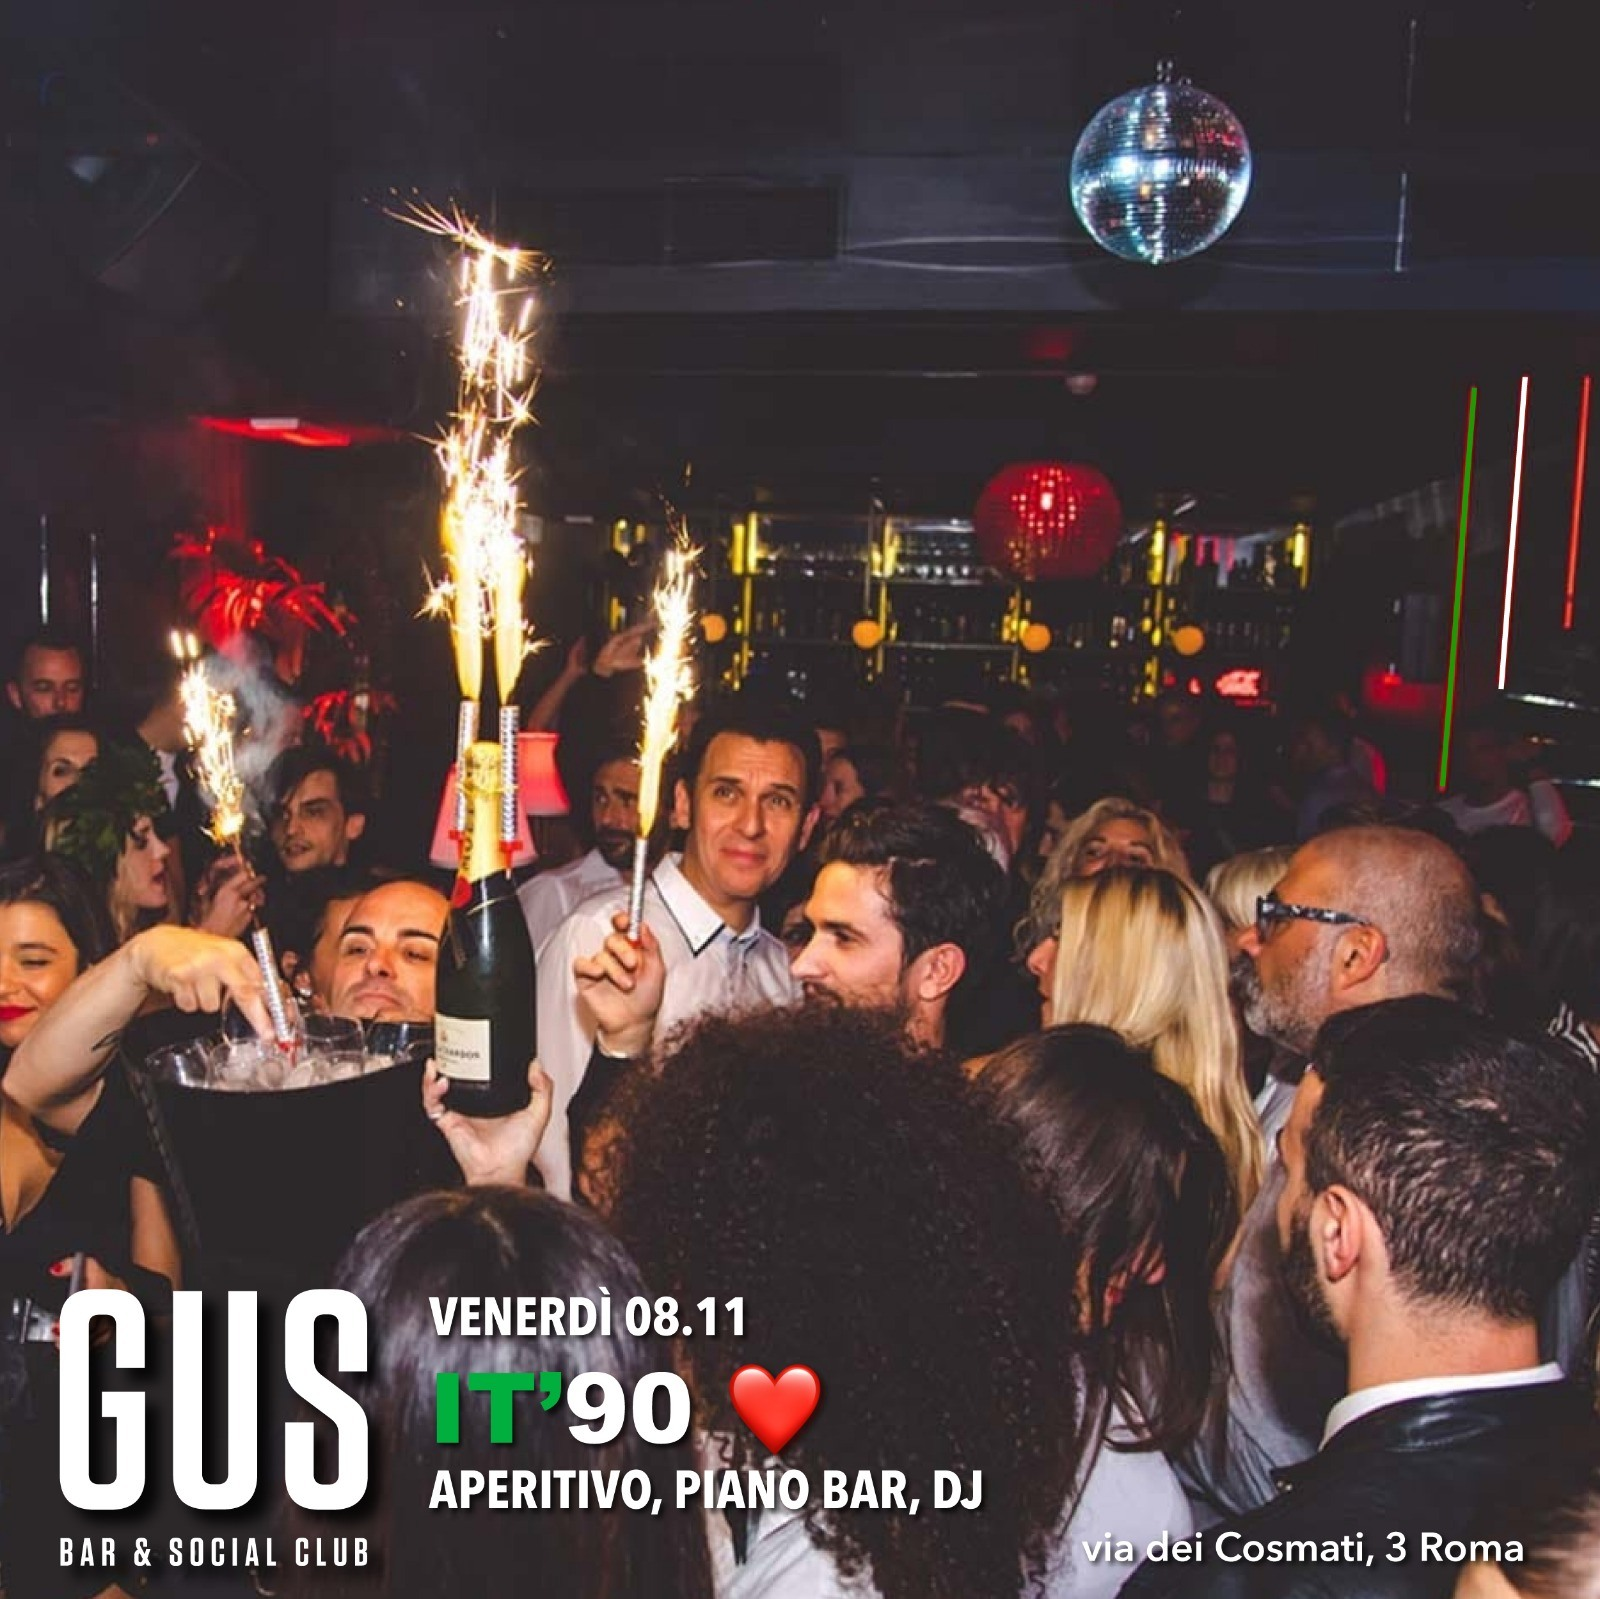 Aperitivo e Disco at Gus Club venerdì 8 novembre 2019